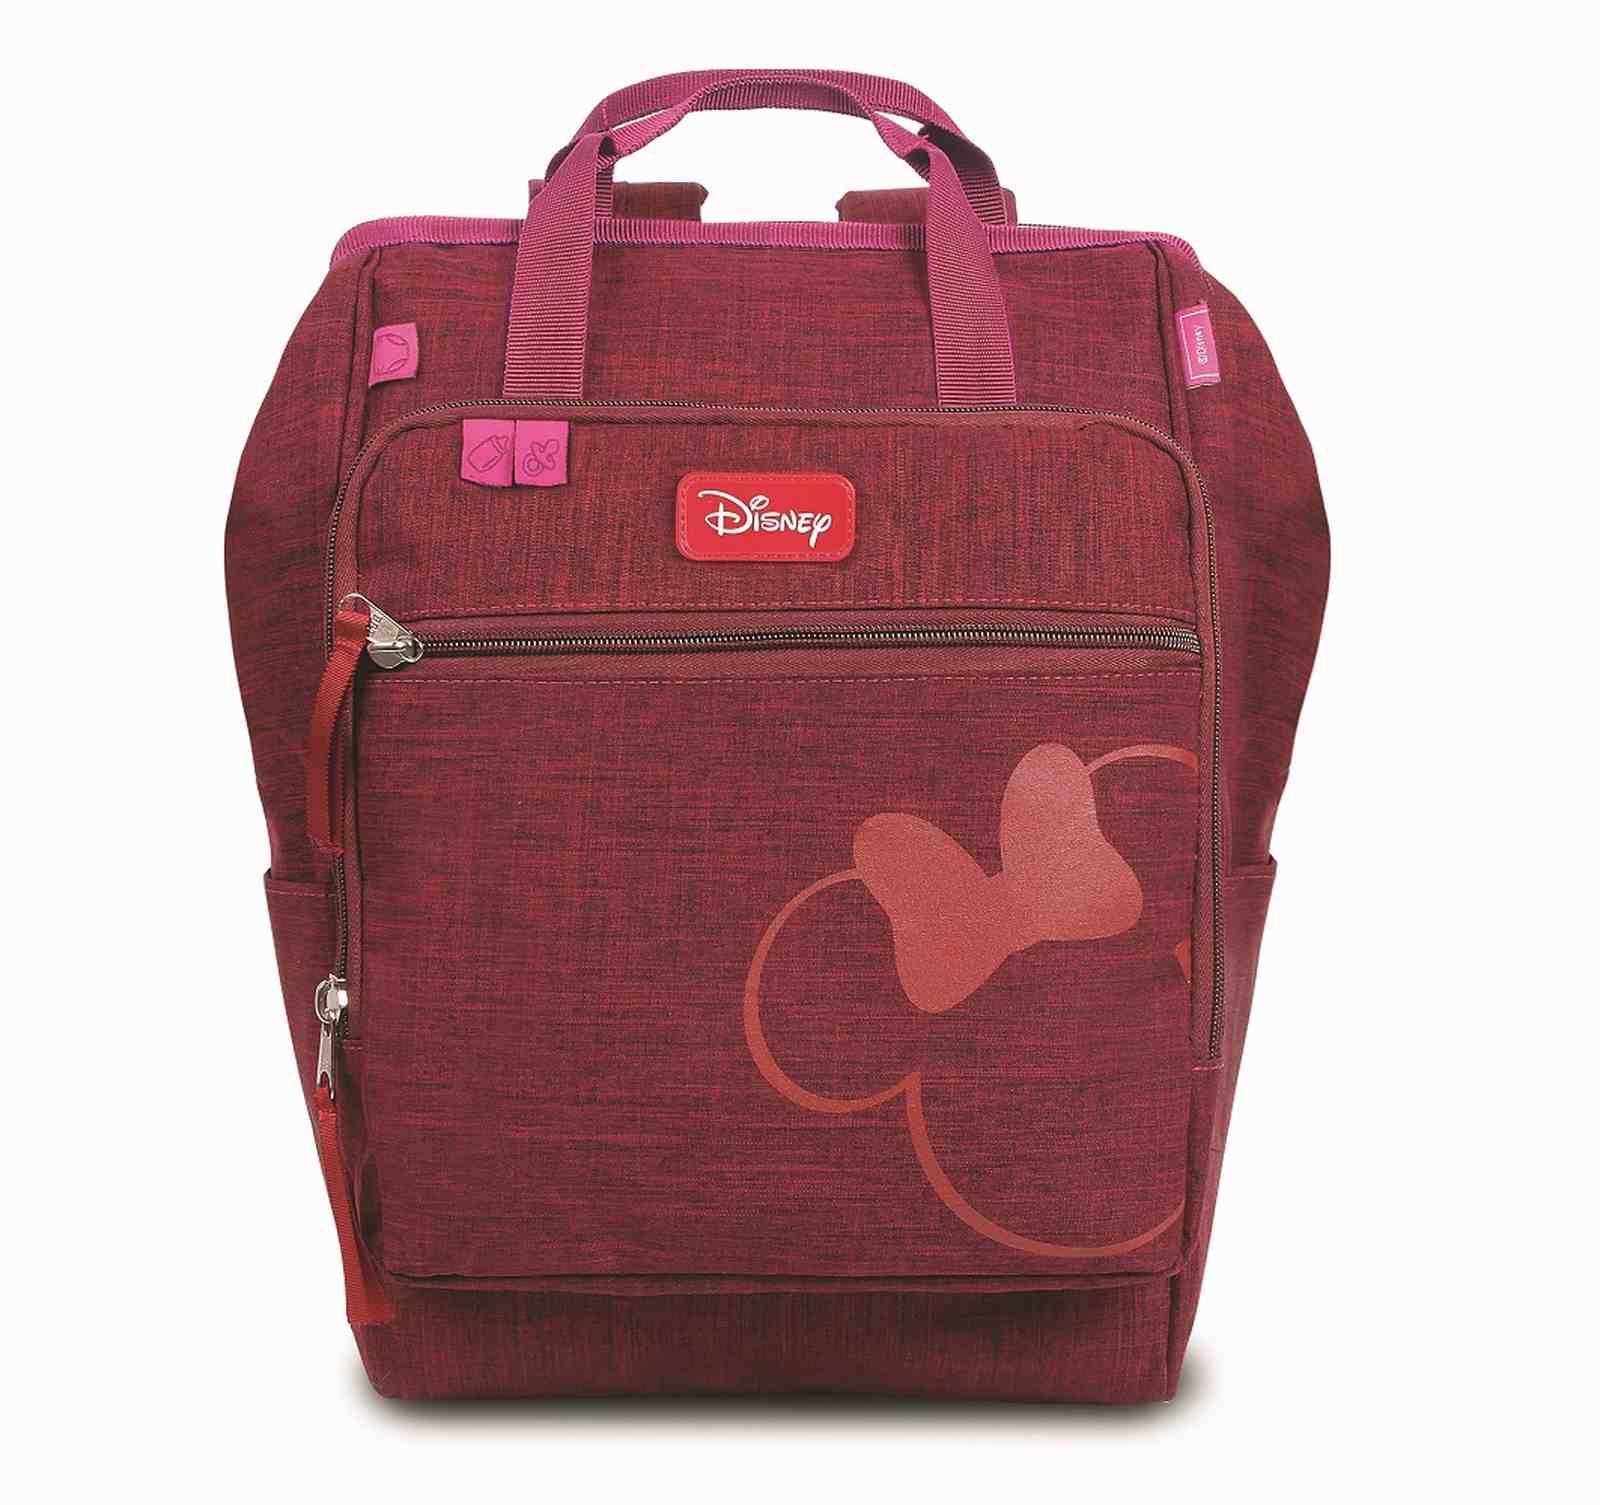 Bolsa Maternidade Disney Minnie Mouse BabyGo BackPack